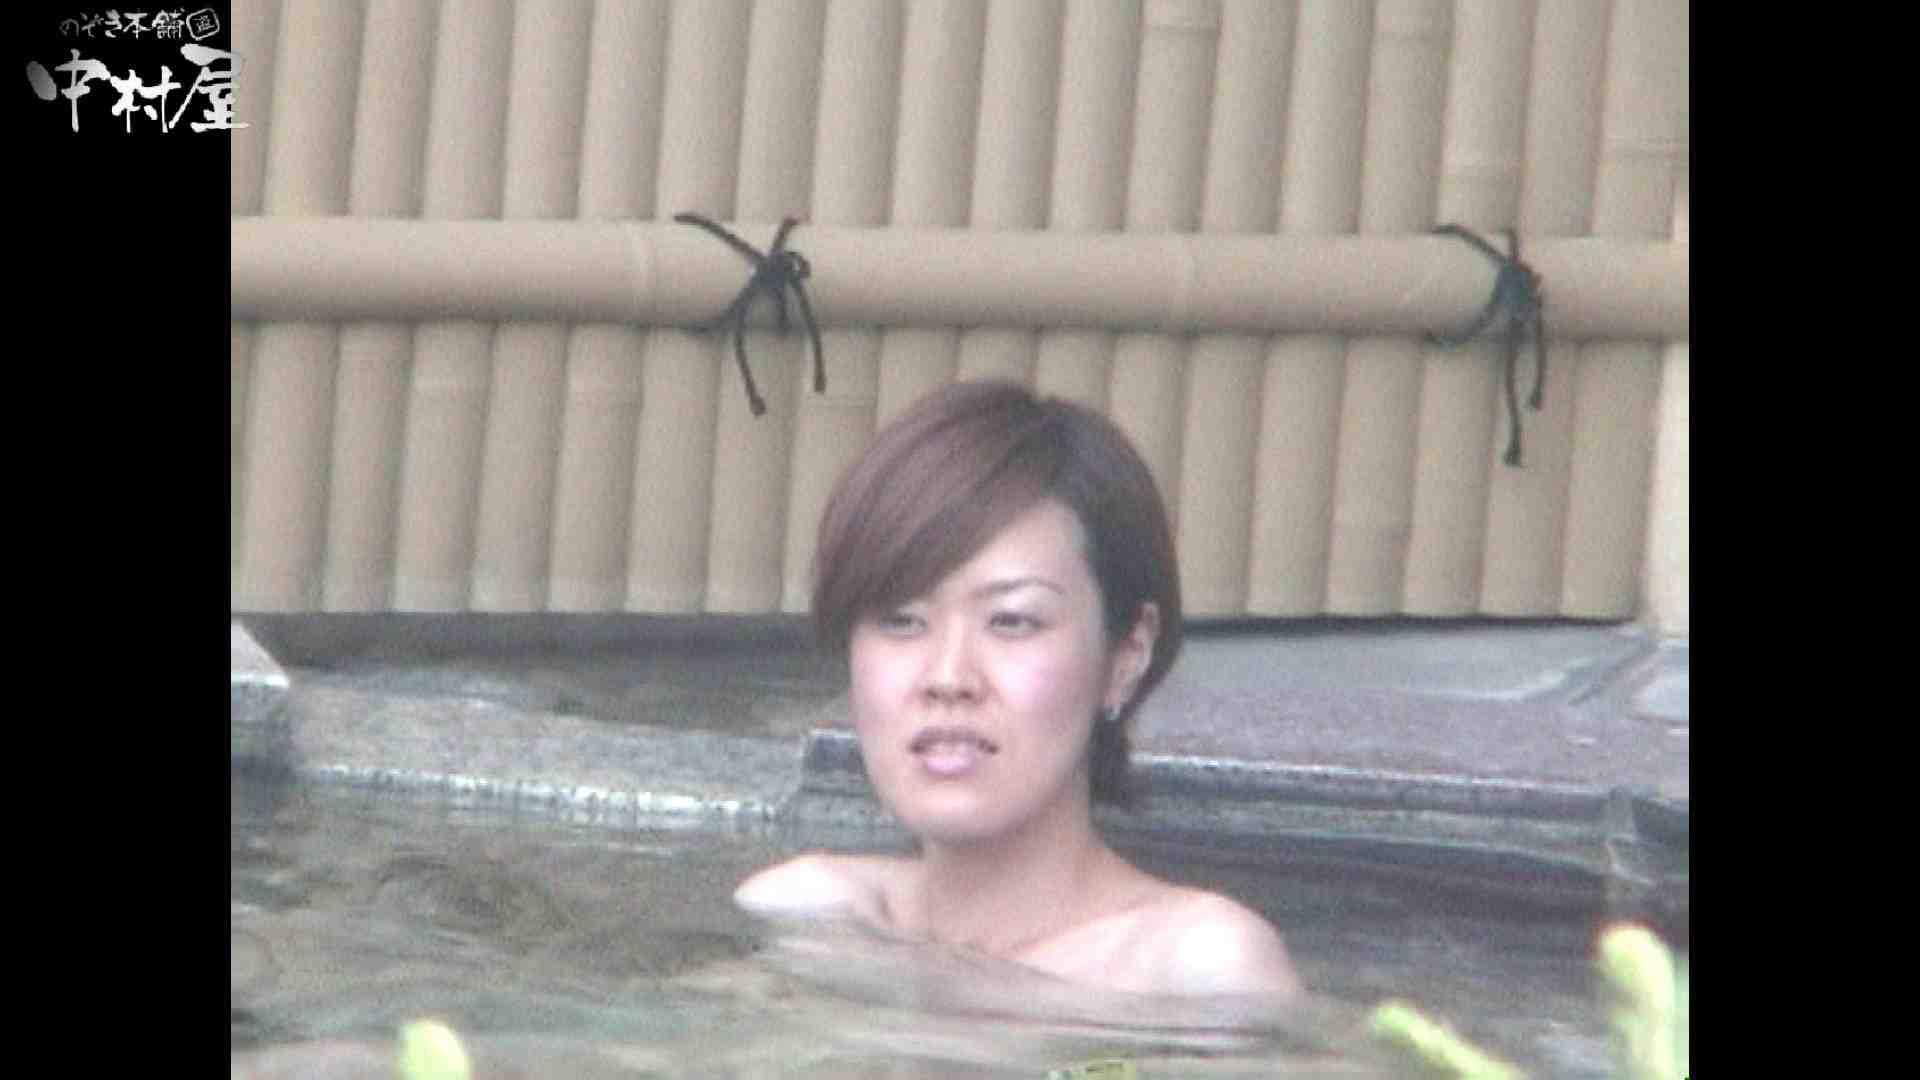 Aquaな露天風呂Vol.961 OLセックス  86画像 60